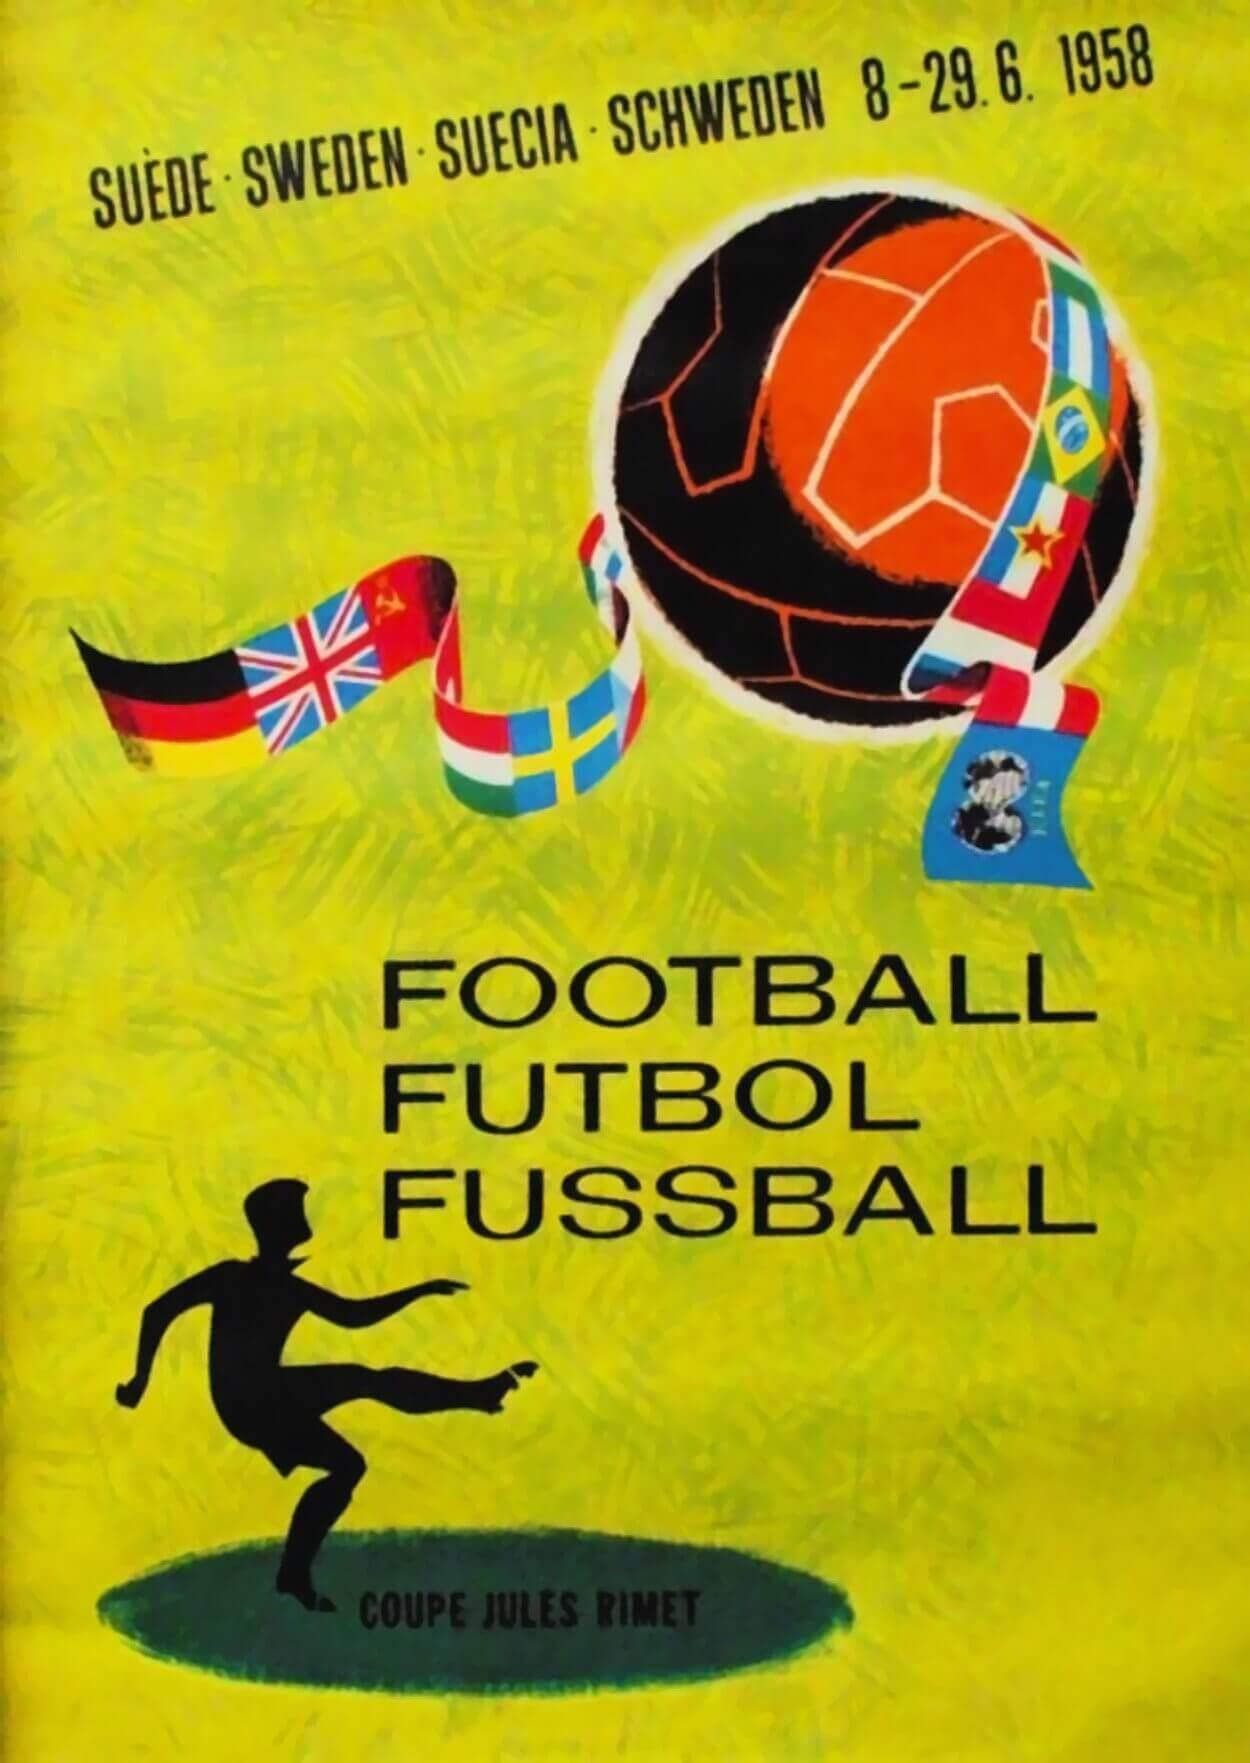 Mundial Uruguay 1930 logo